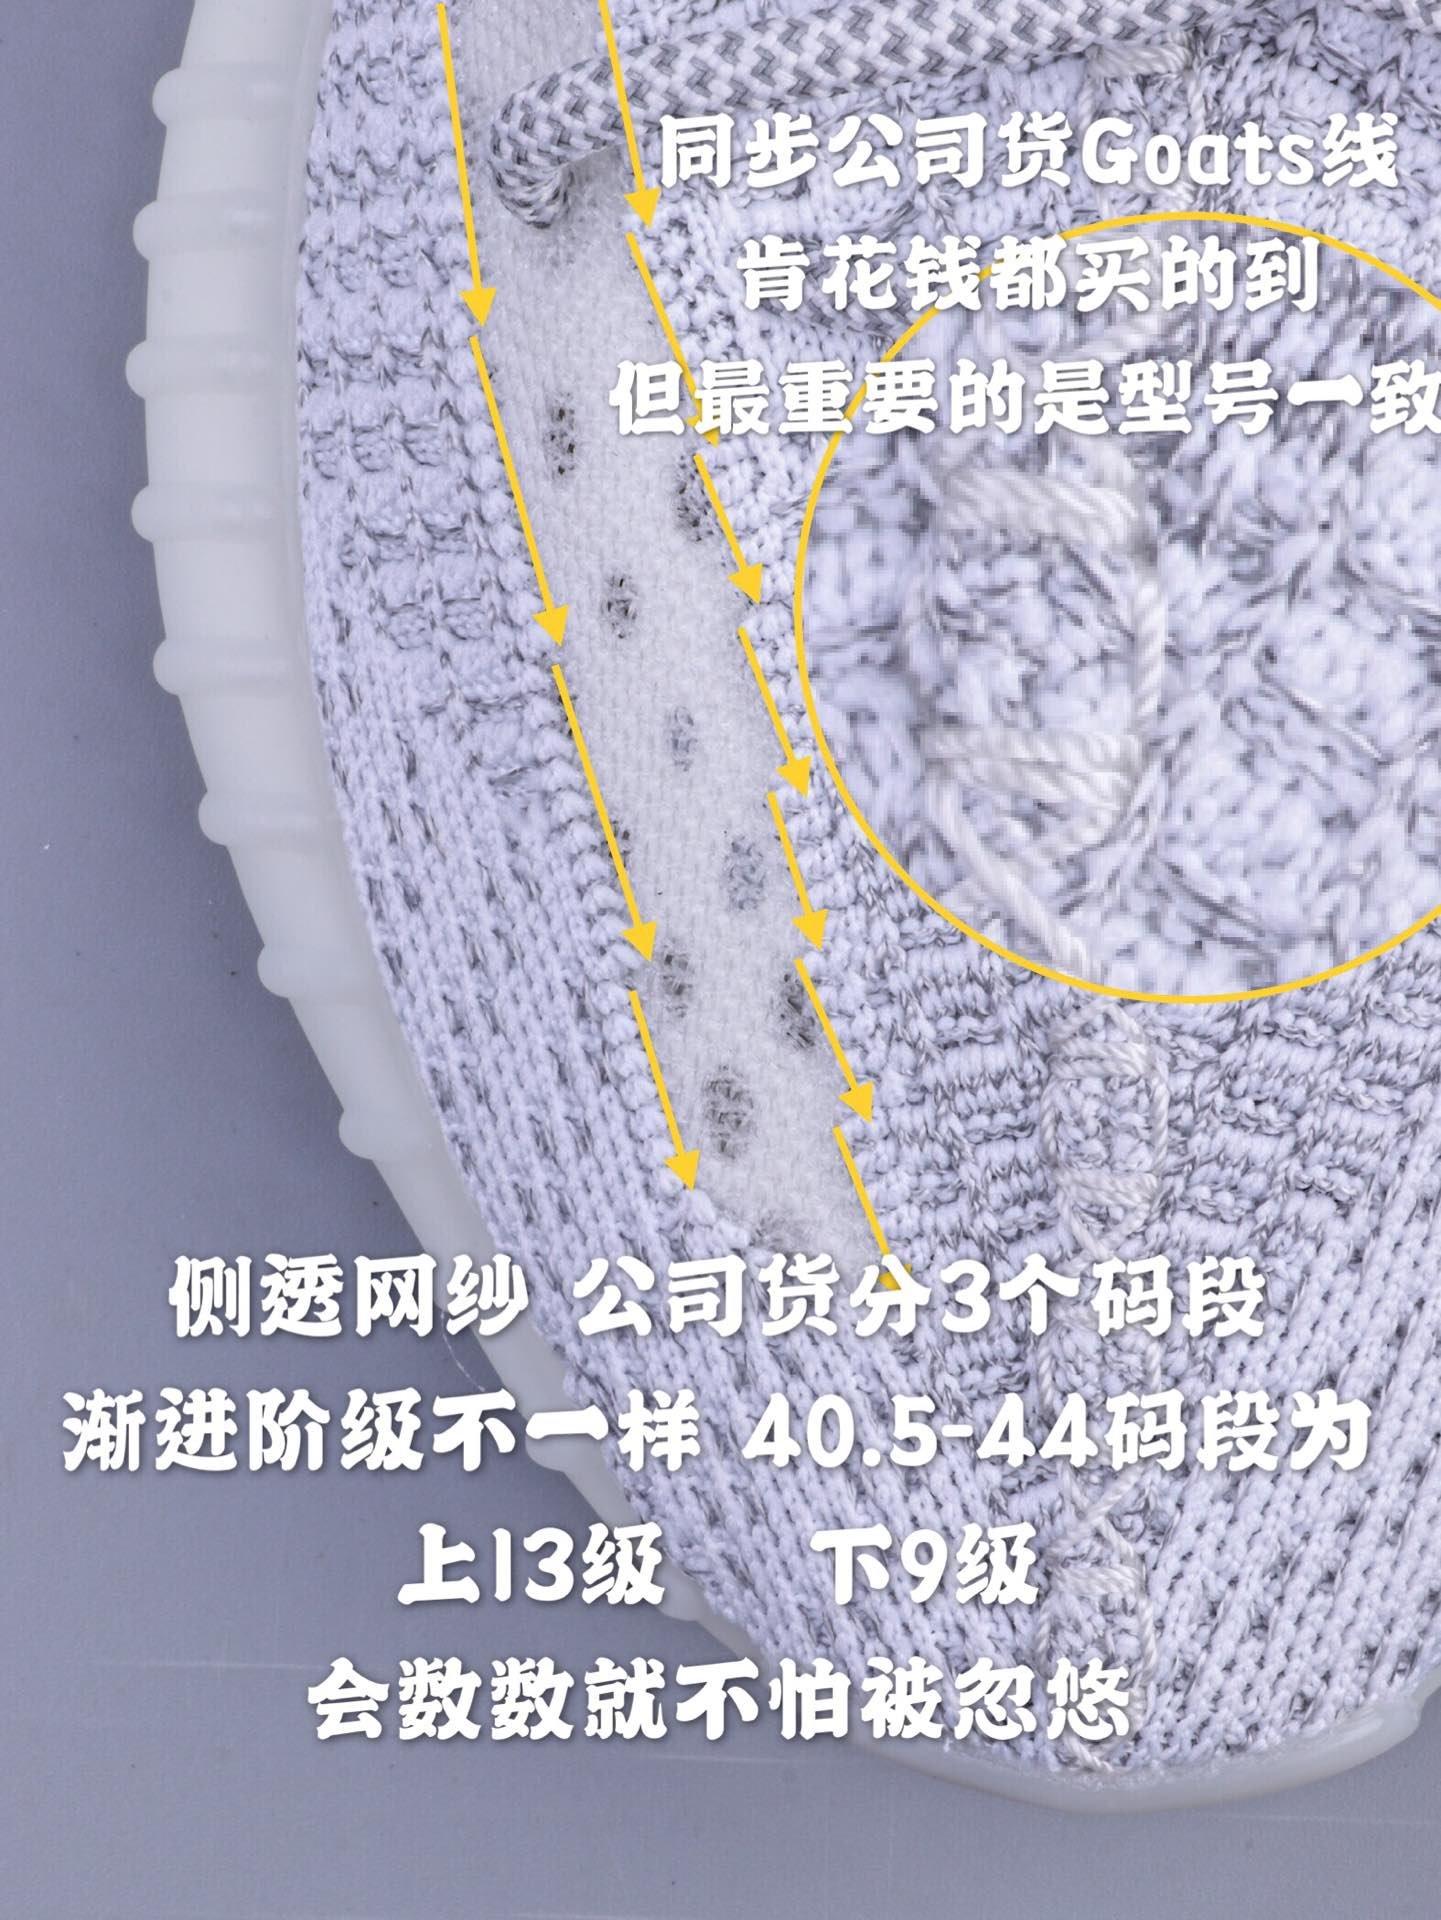 GT版本-椰子350 满天星白 EF2367-GT纯原细节图解